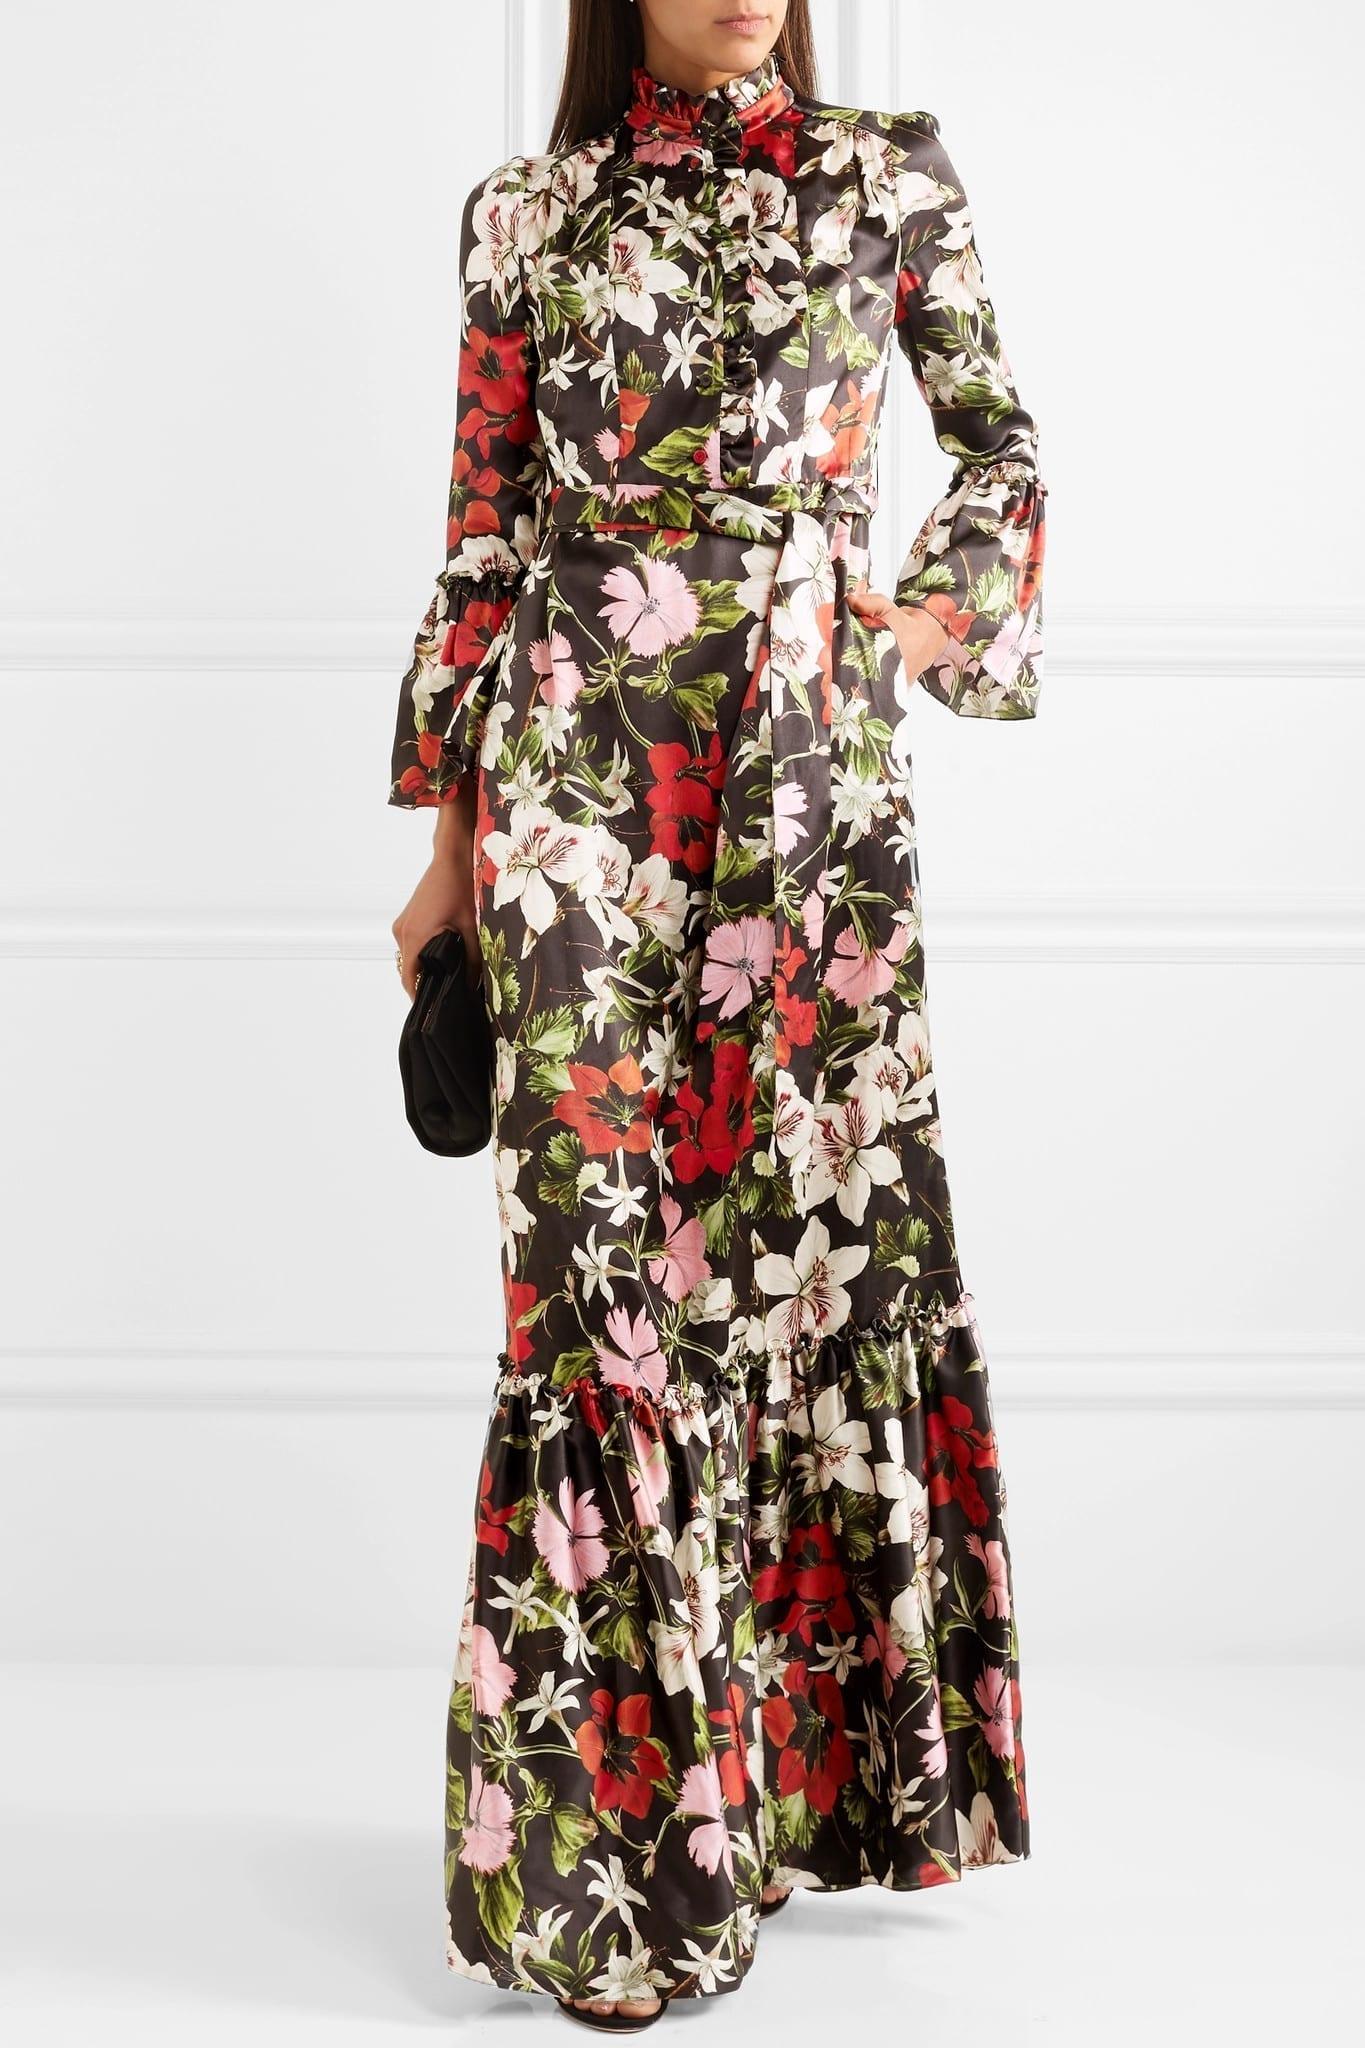 ERDEM Stephanie Floral-Print Silk-Satin Black Gown